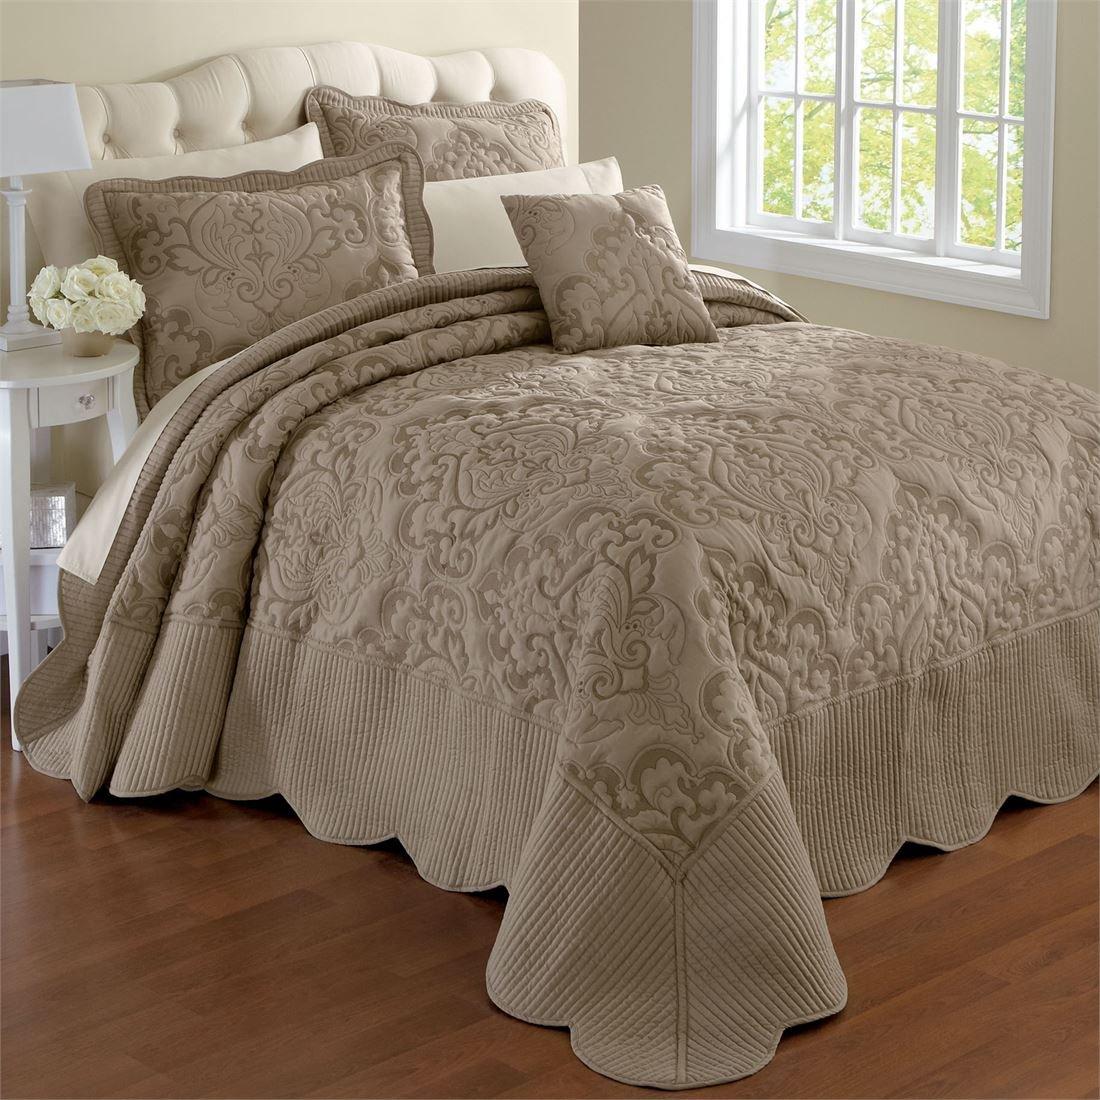 BrylaneHome Amelia Bedspread (Taupe,King)